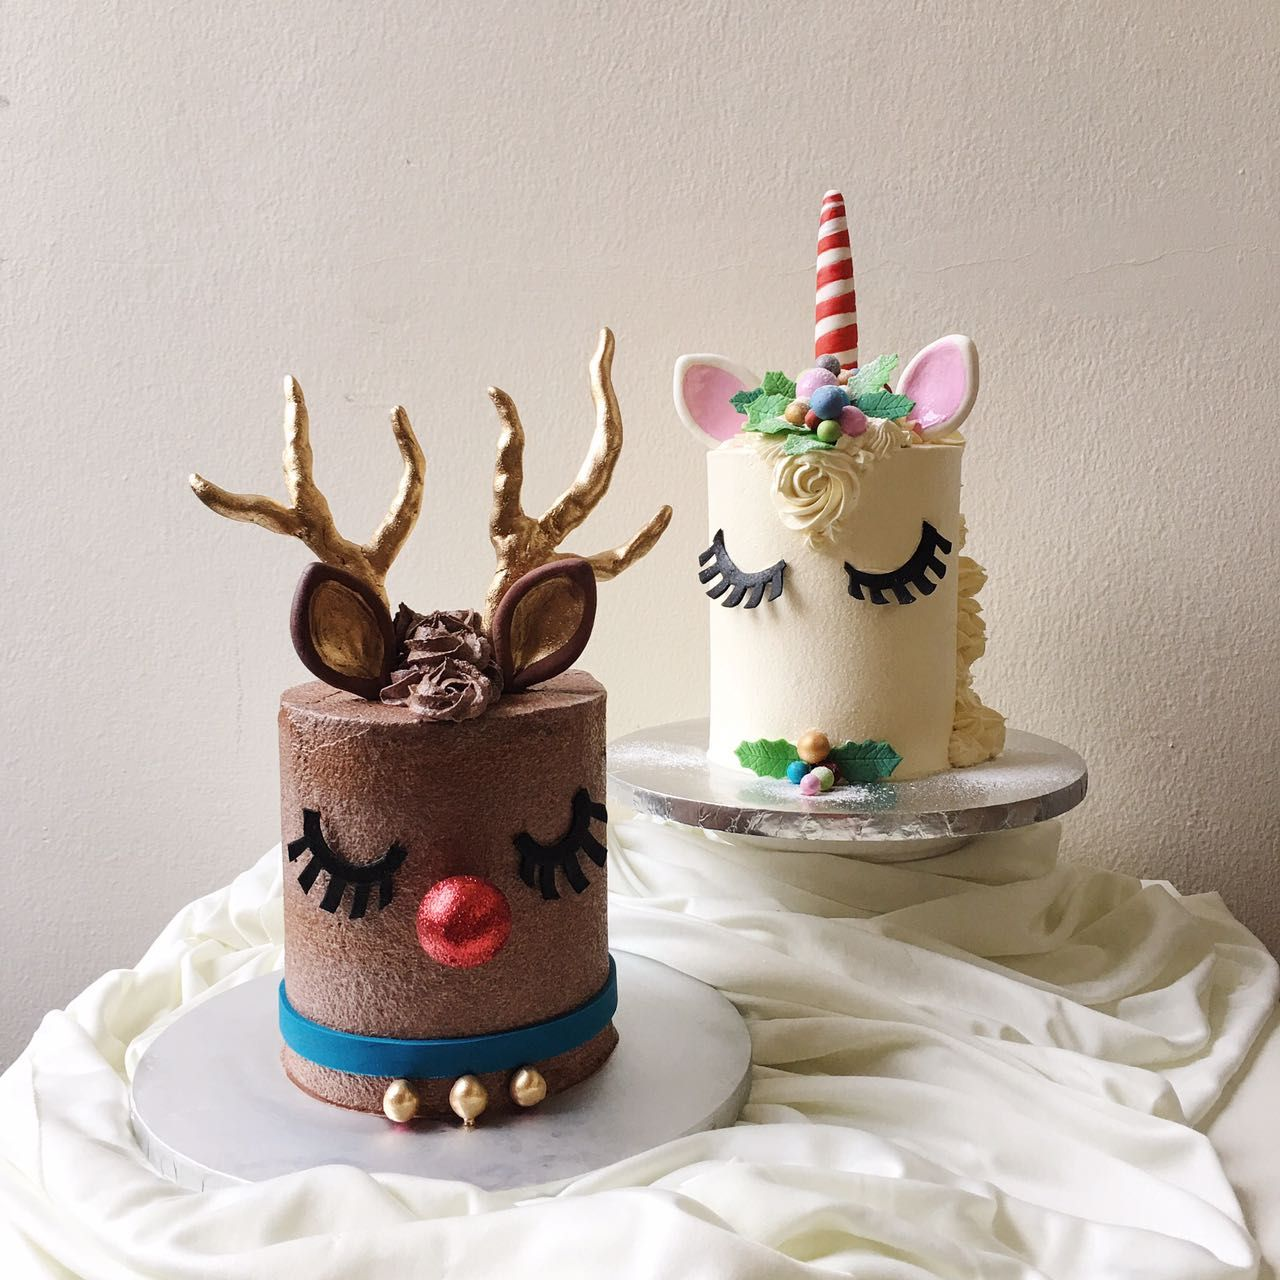 Christmas Rudolph And Unicorn Cake Reindeer Cakes Cake